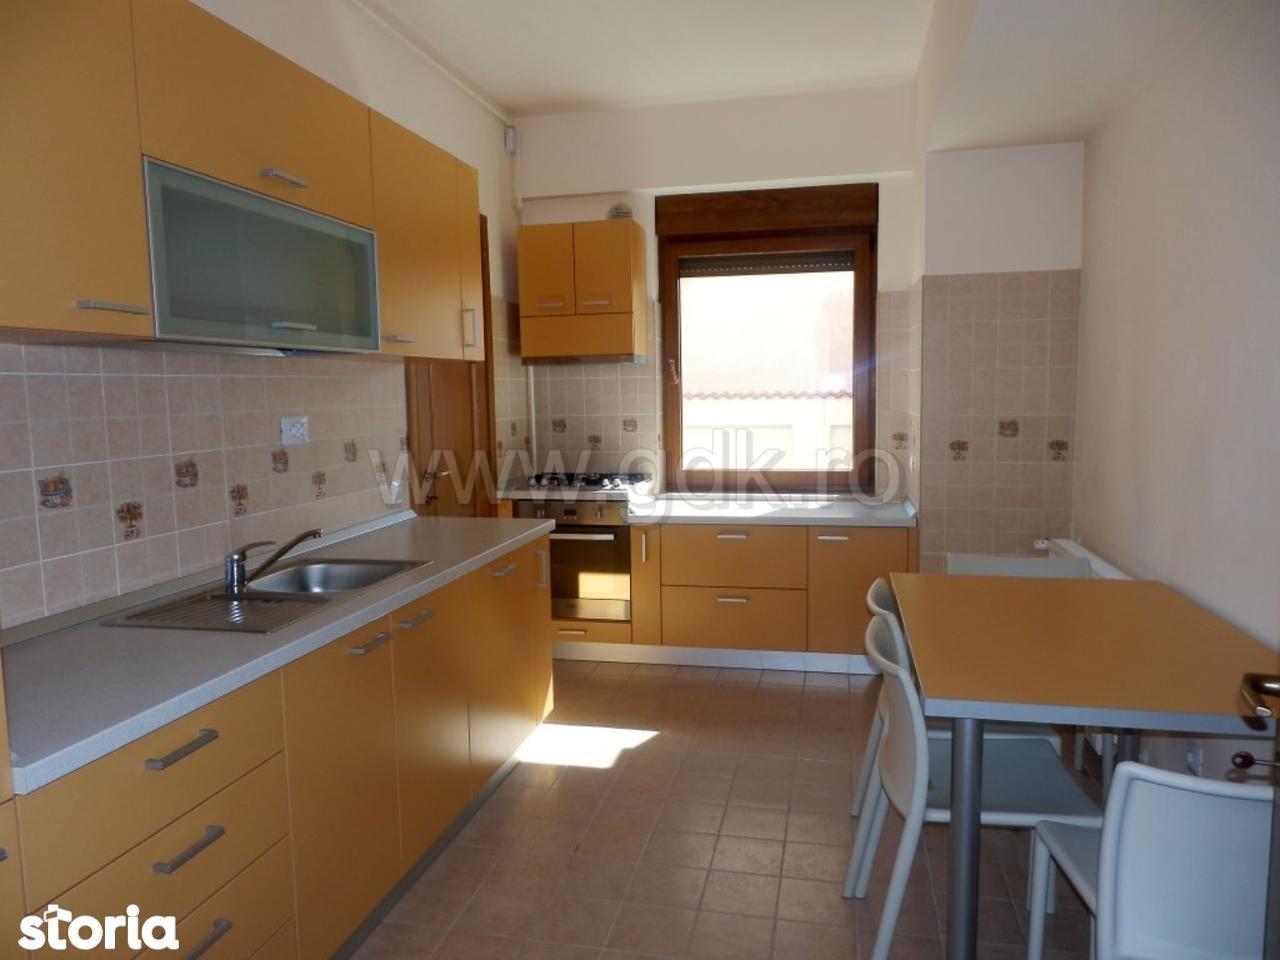 Apartament de inchiriat, București (judet), Strada Căpitan Gheorghe Calpan - Foto 3